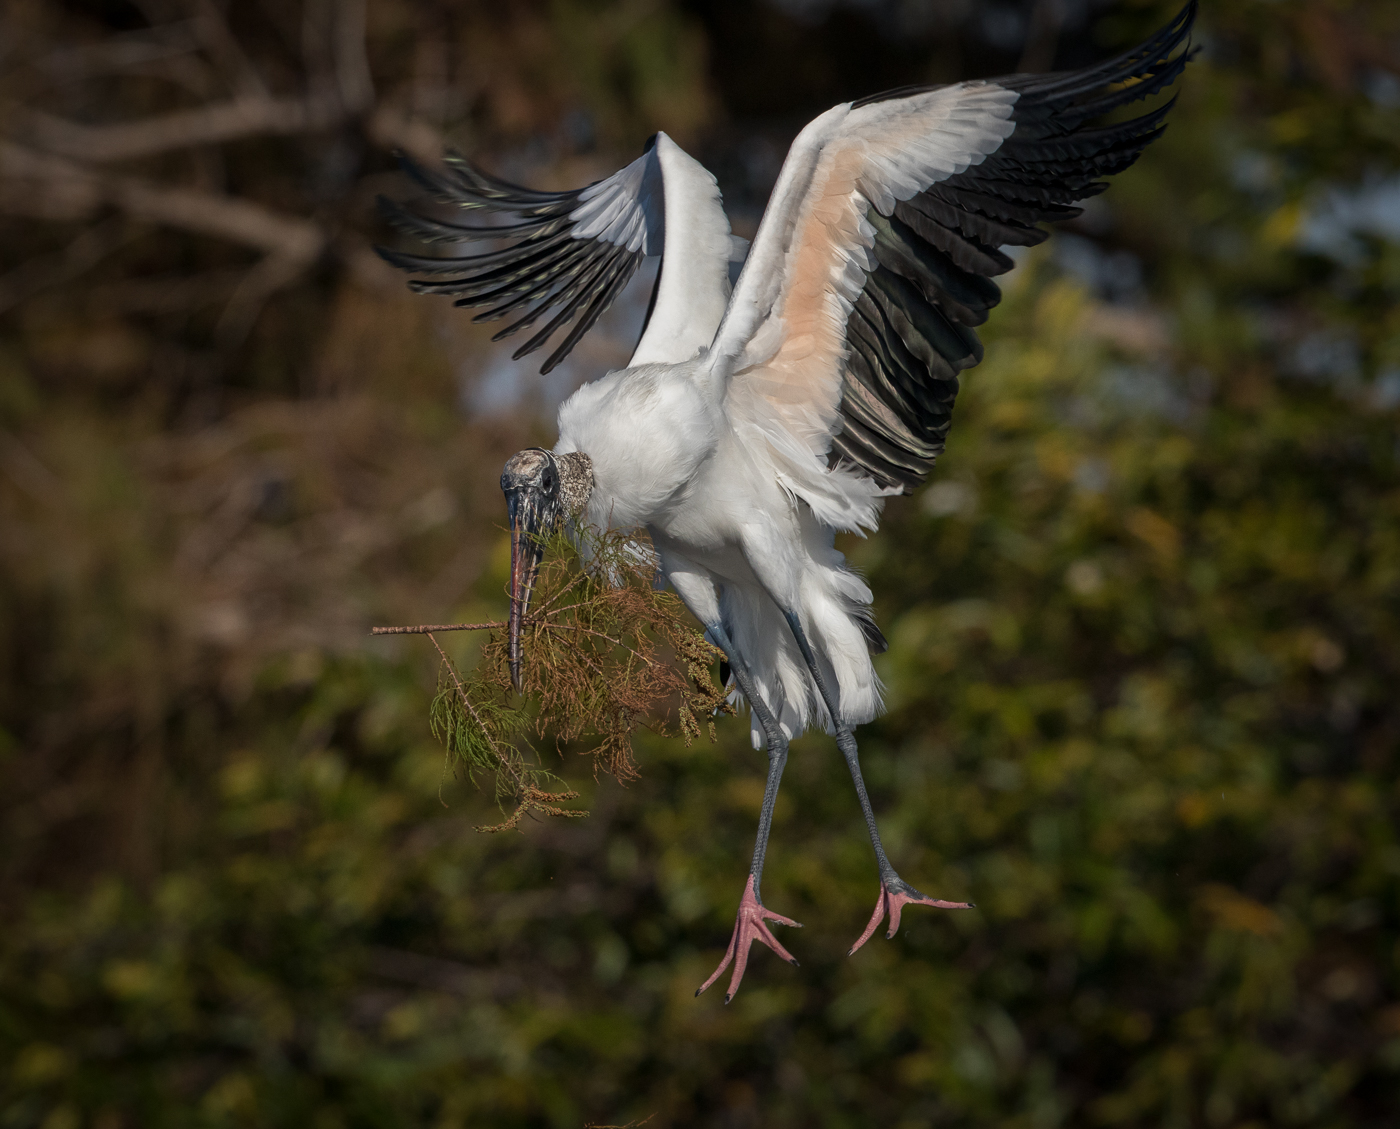 Woodstork bring in nesting material